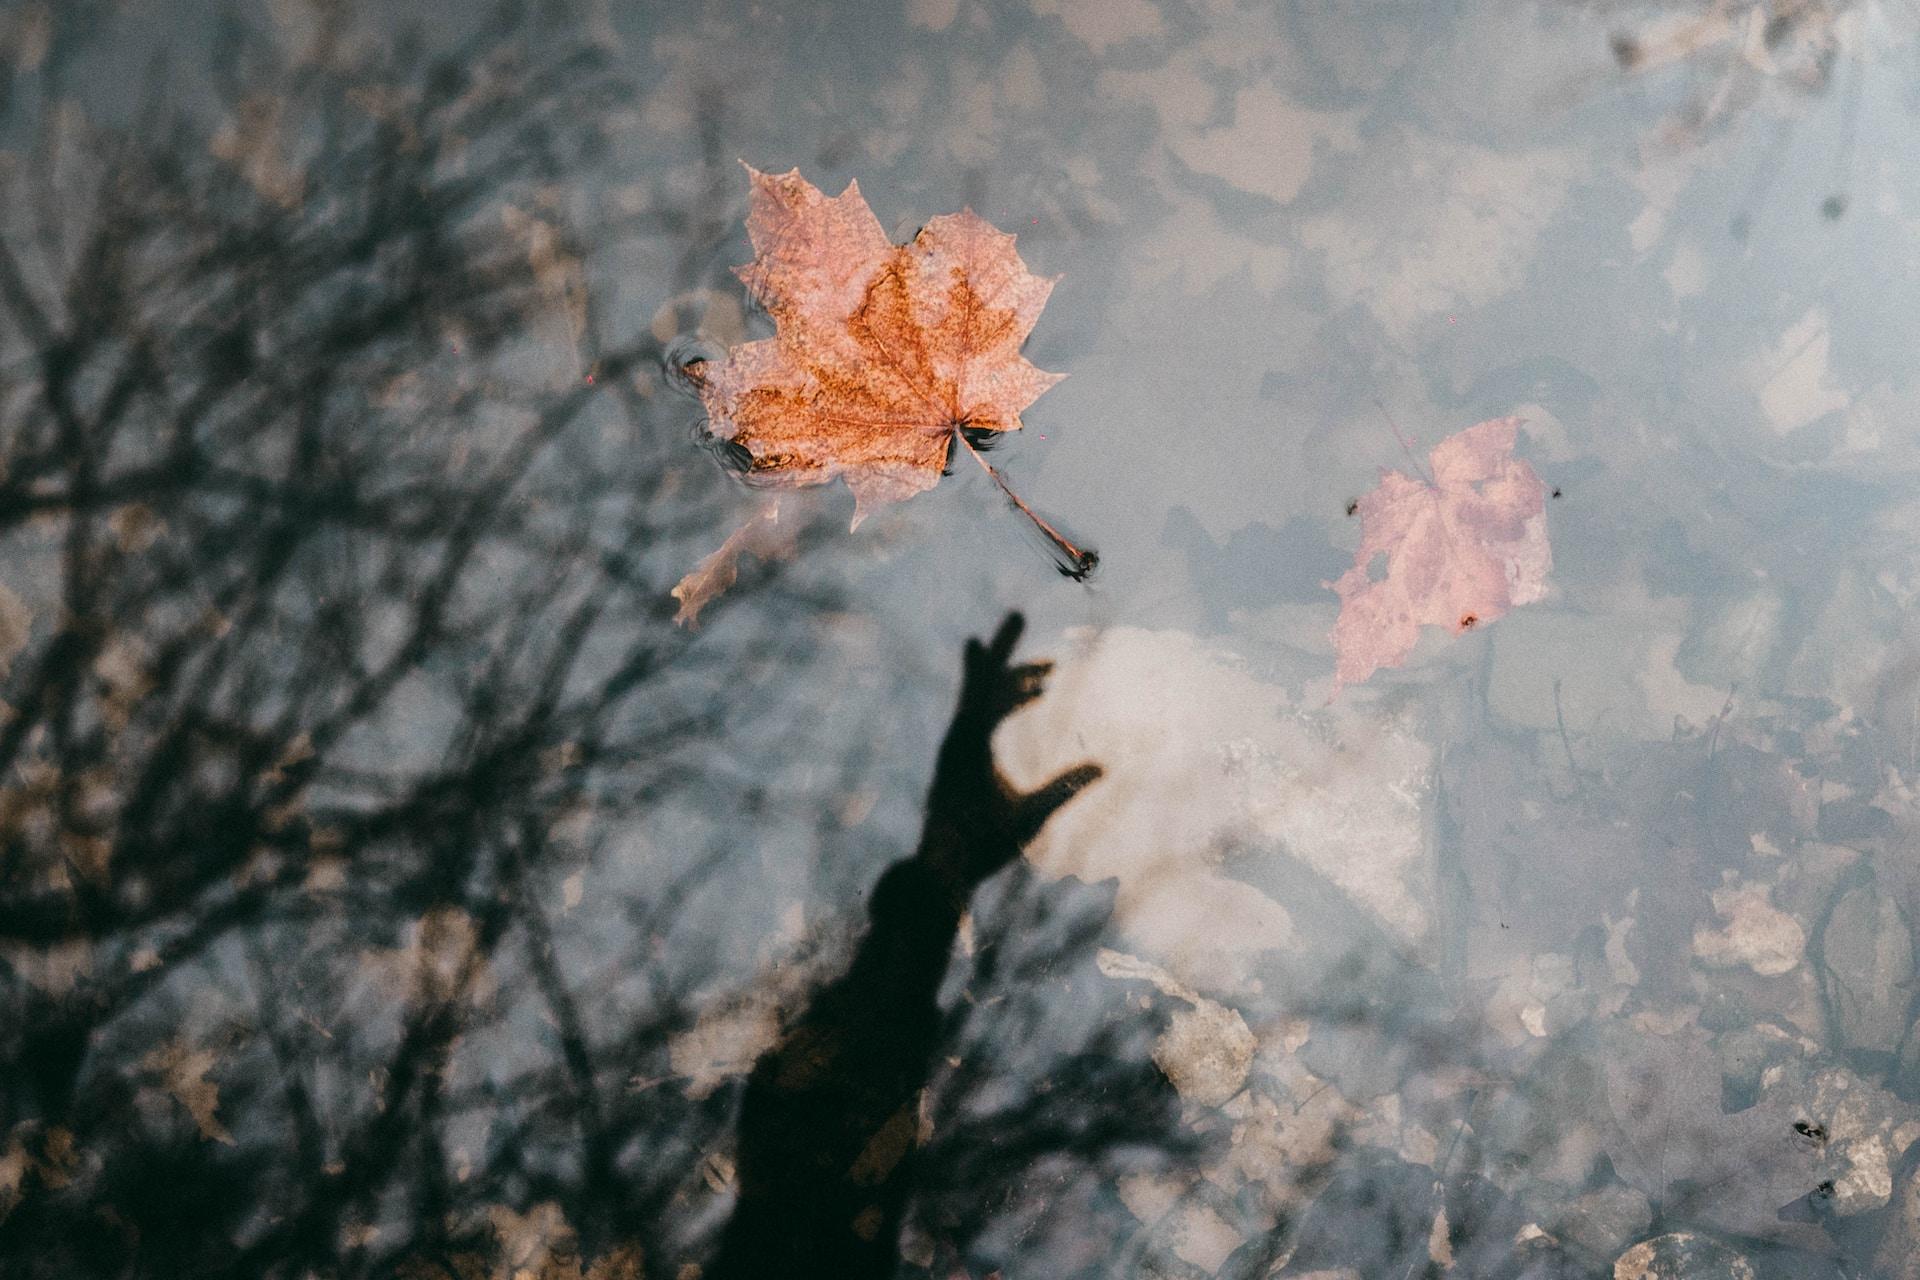 maple leaf floating on air